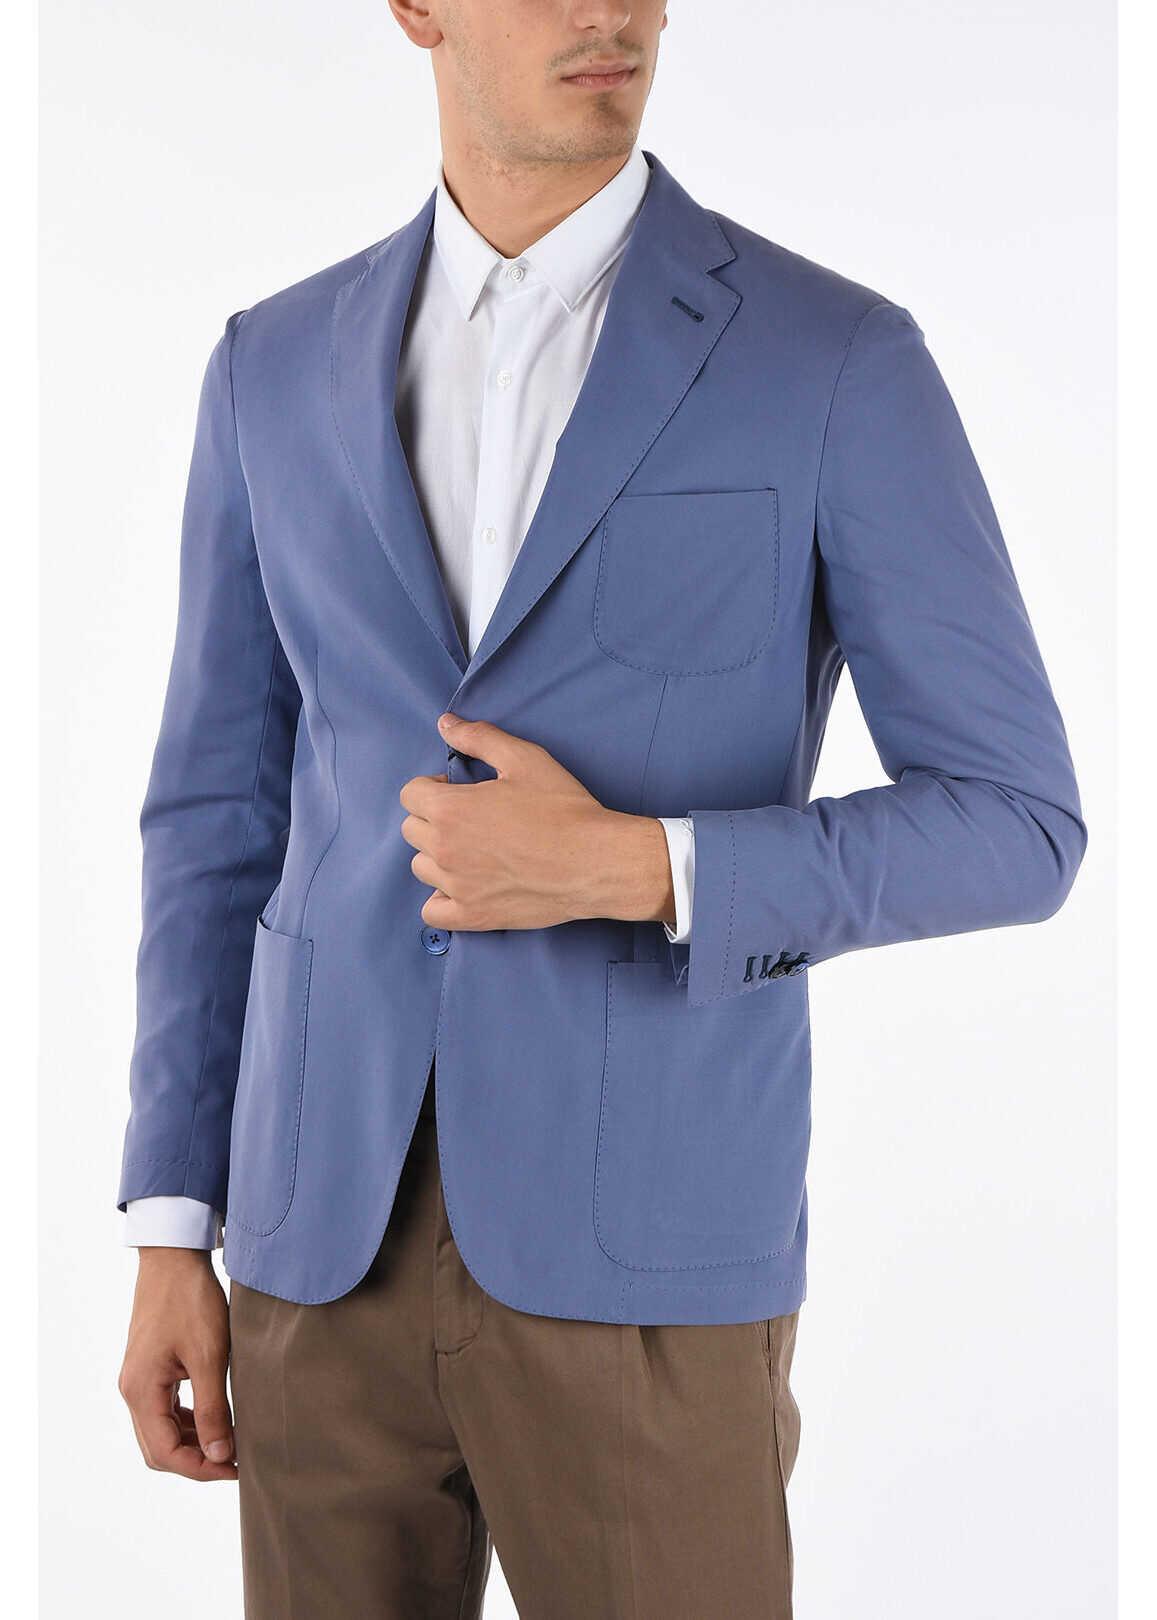 CORNELIANI ID silk IDENTITY 2-button blazer LIGHT BLUE imagine